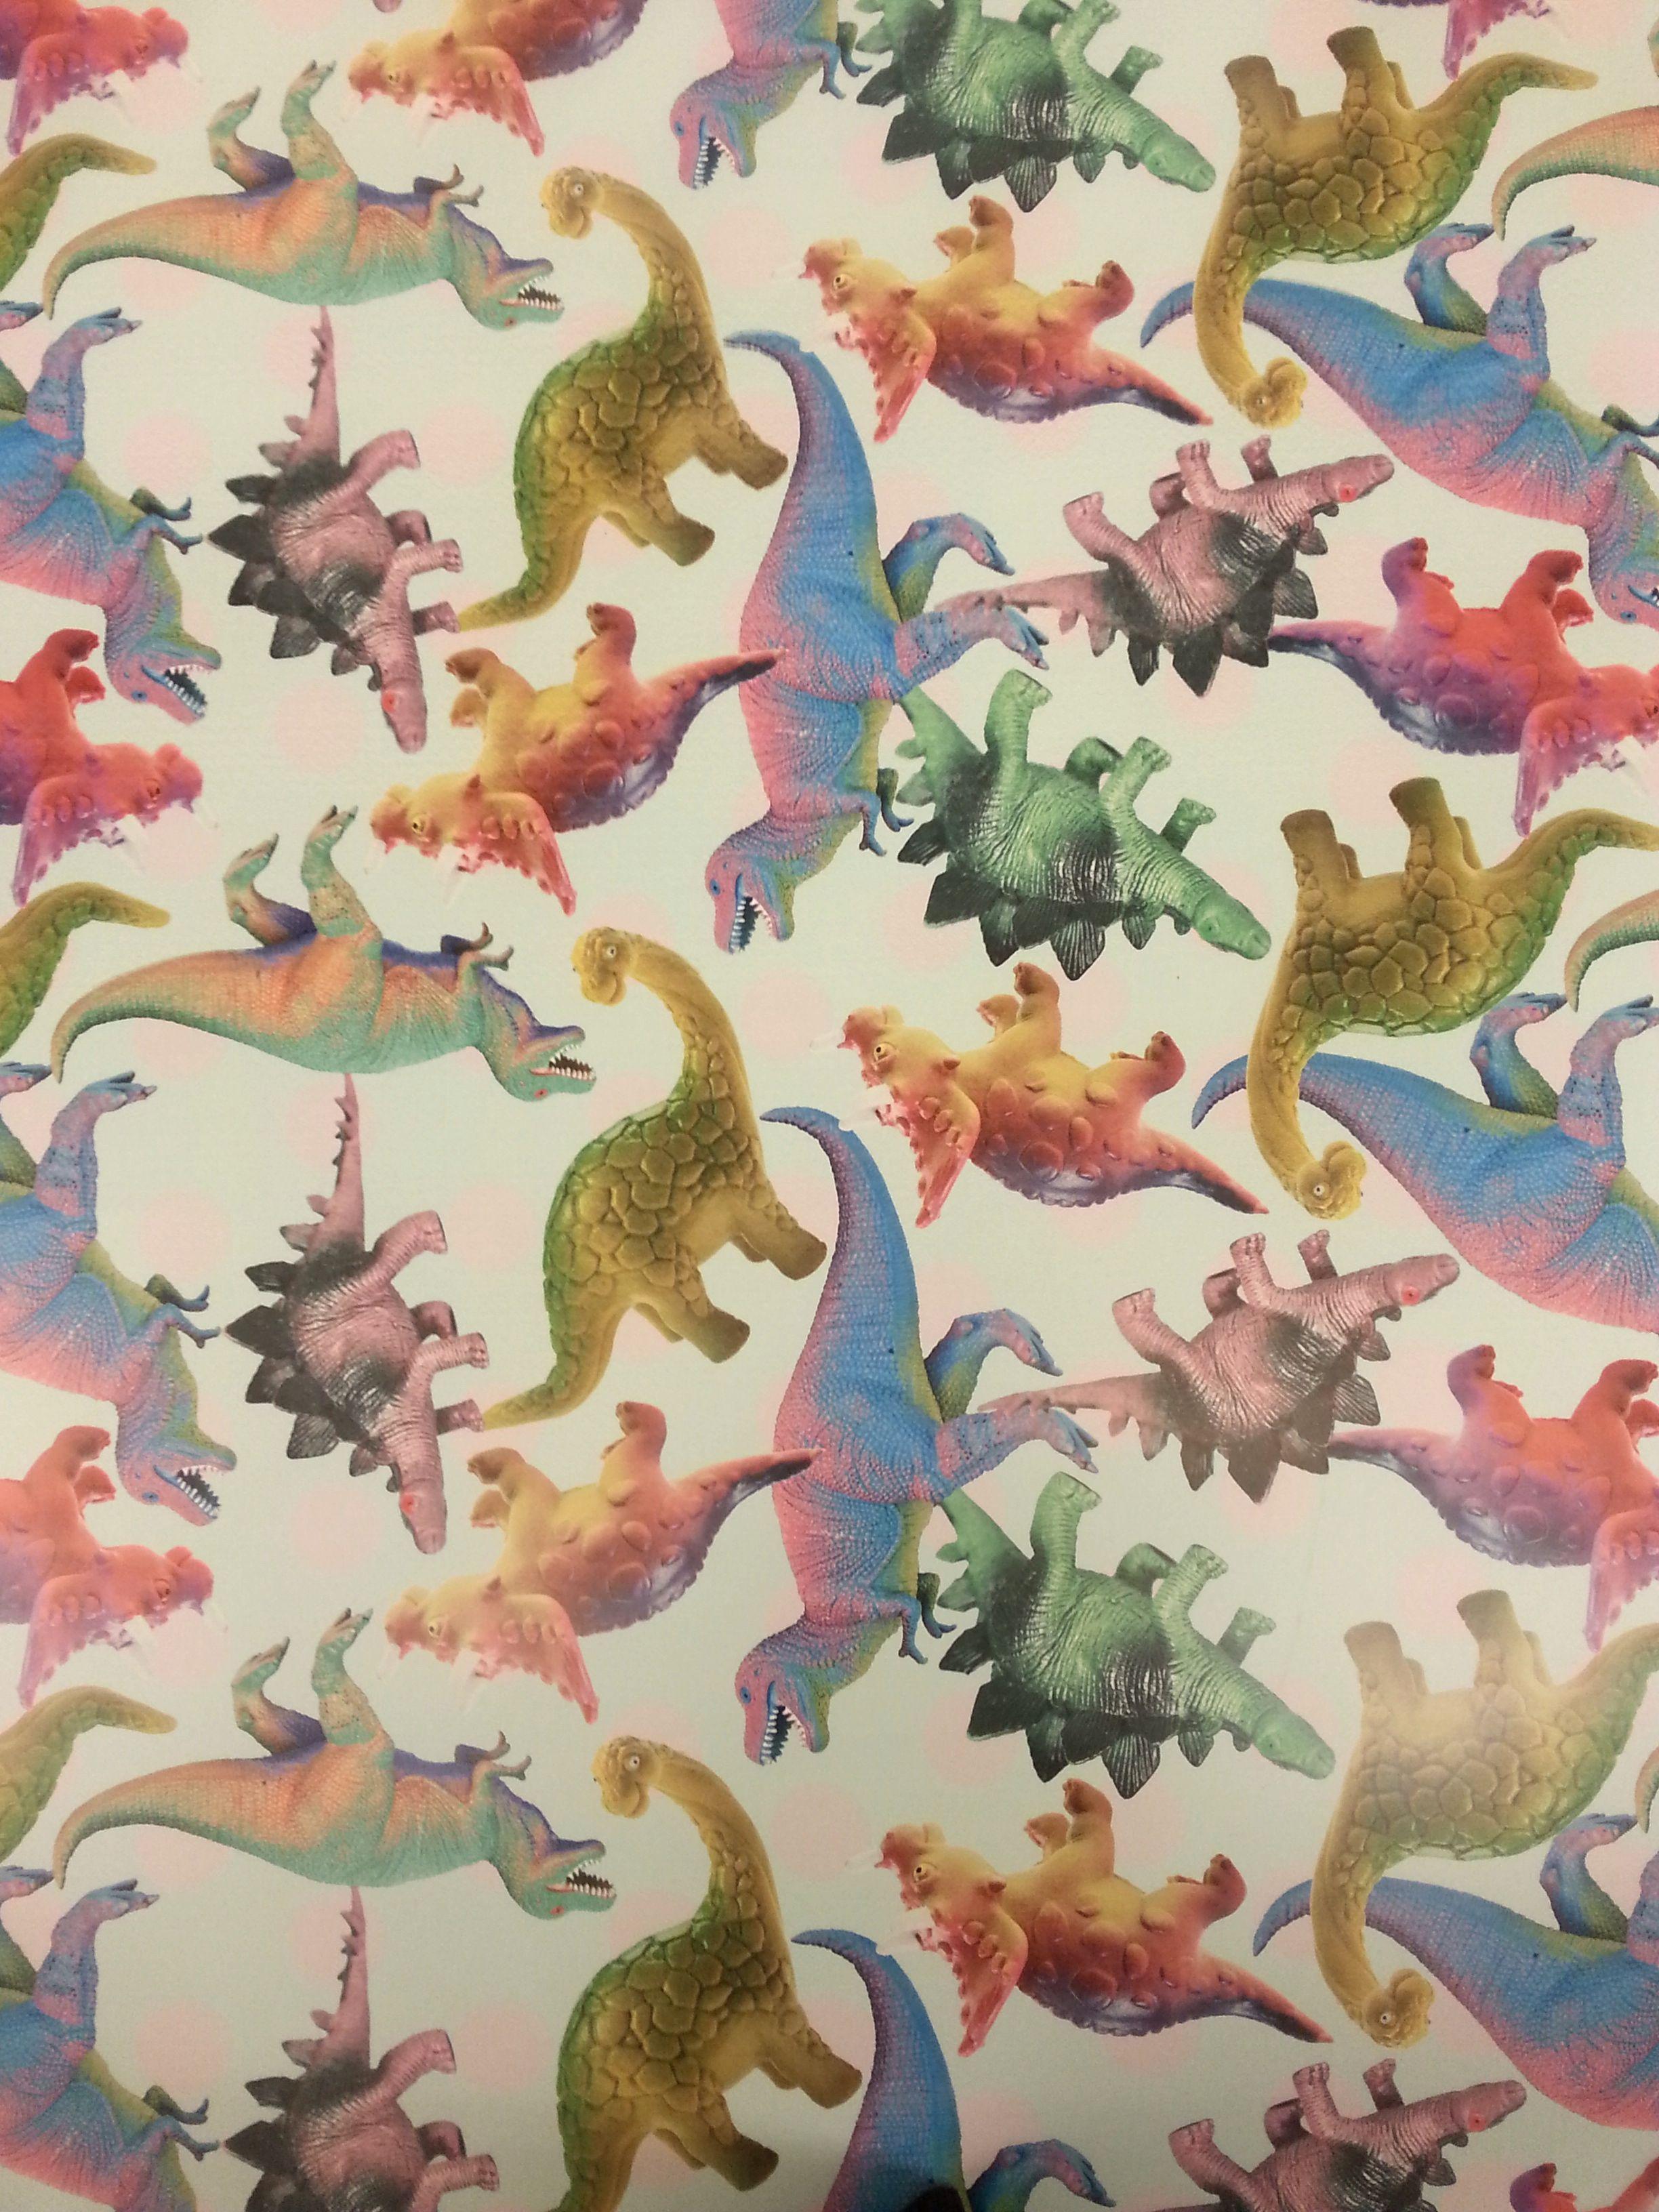 dinosaur phone wallpaper - photo #18